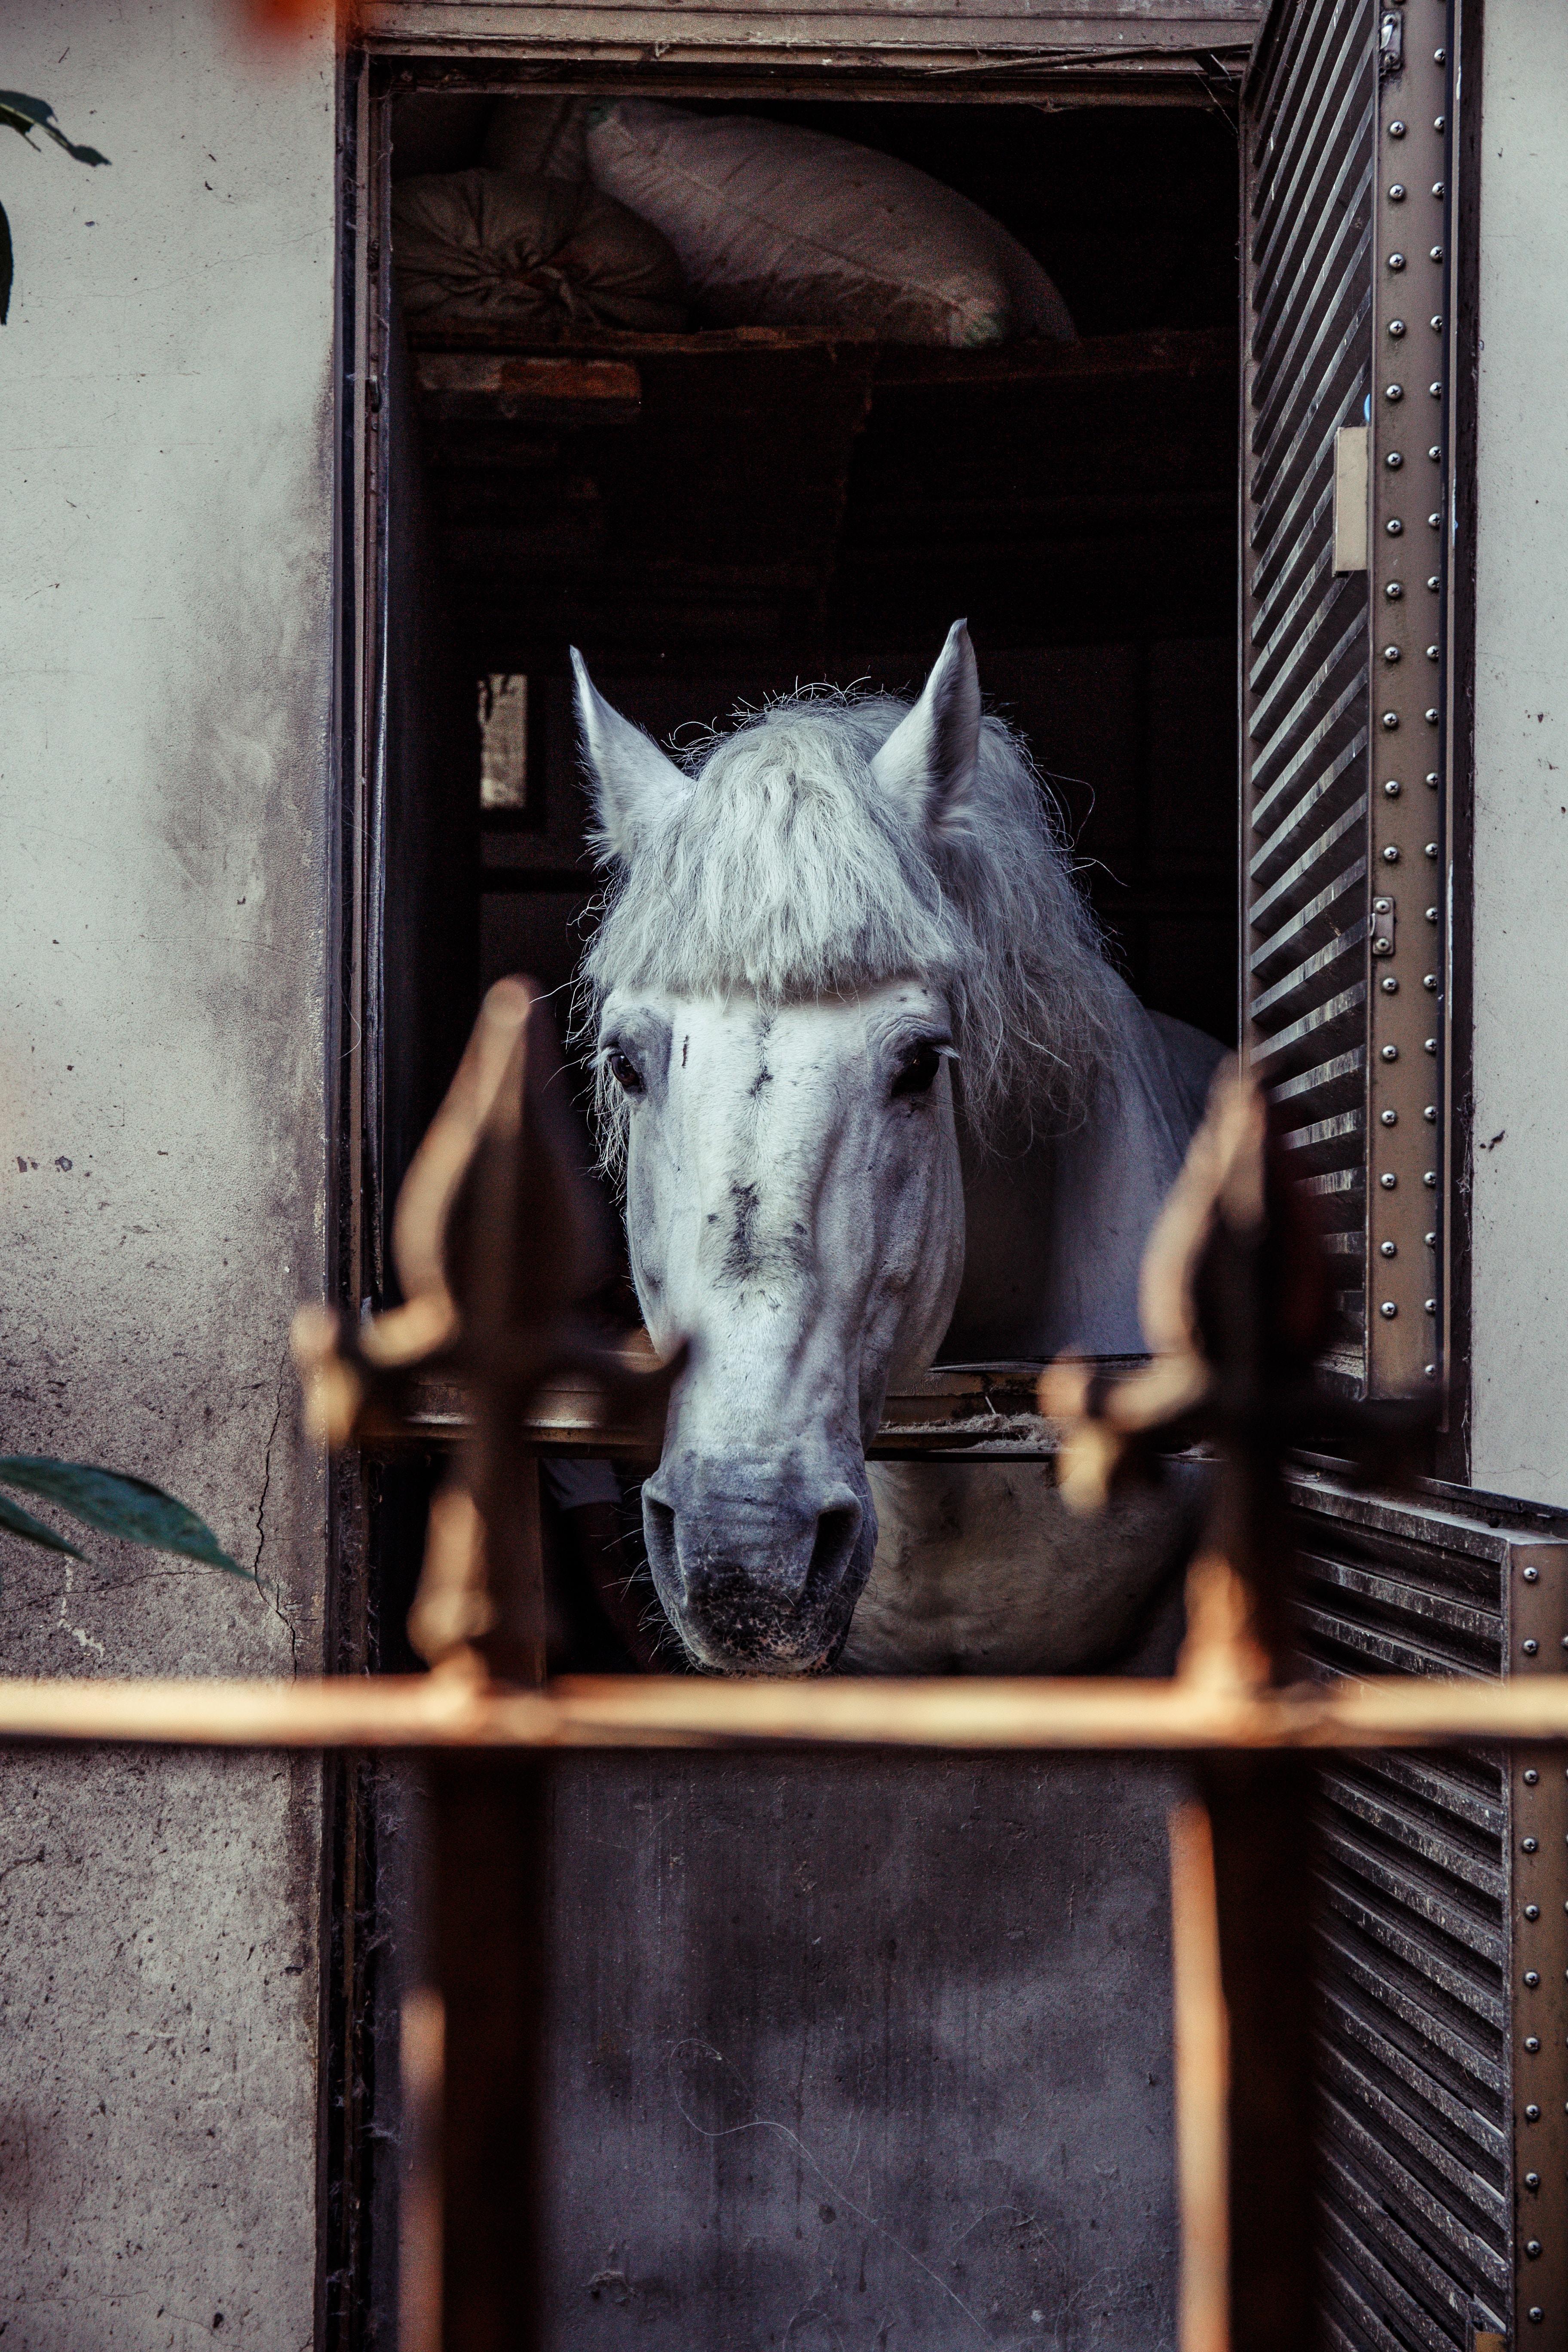 white horse peek on window